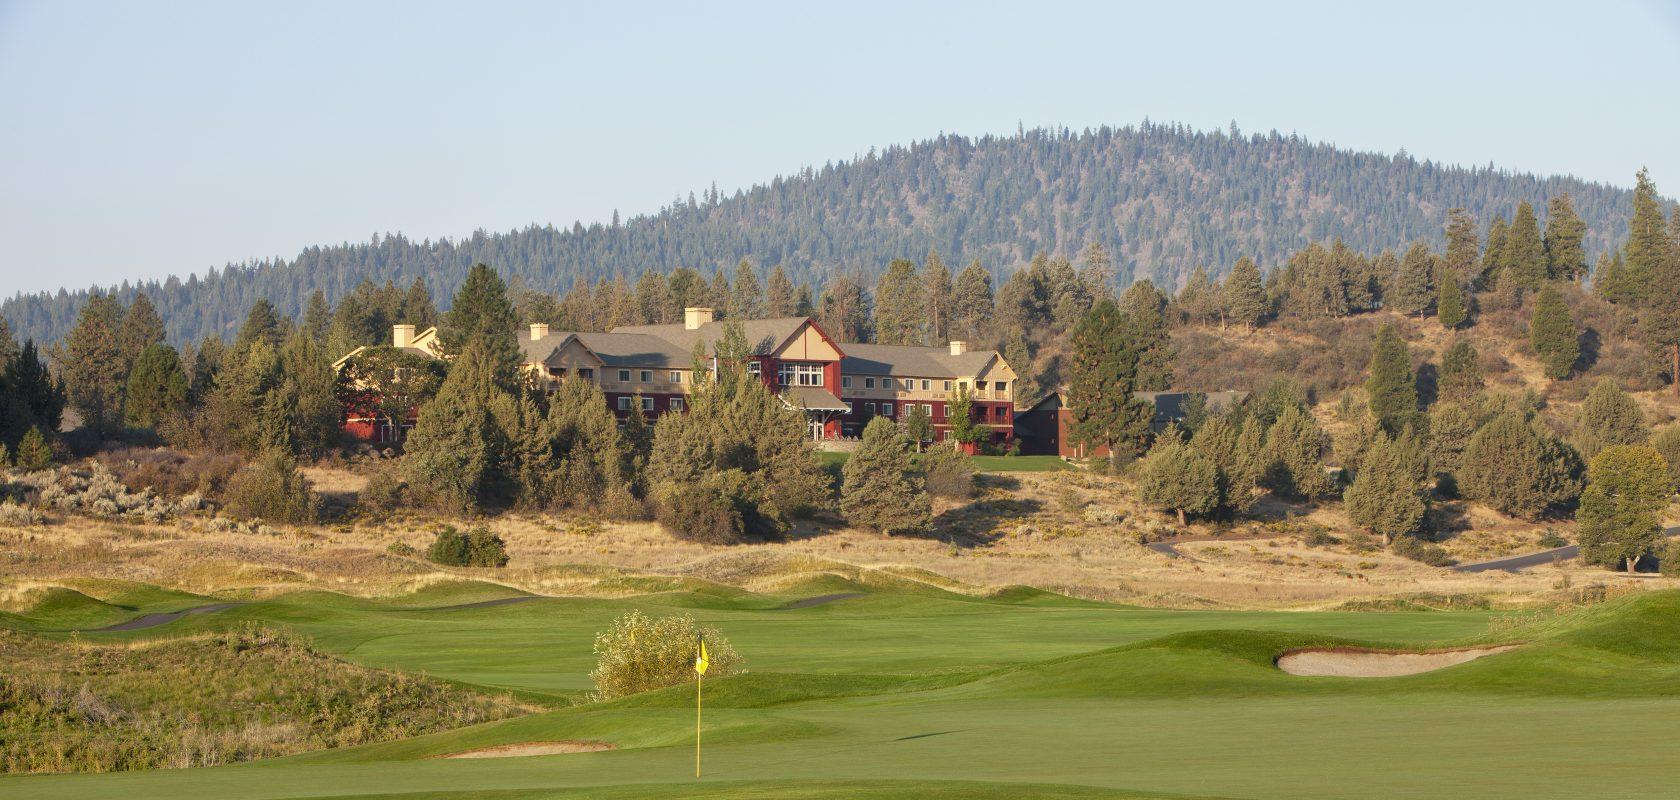 Running Y Ranch Resort, Klamath Falls, Oregon